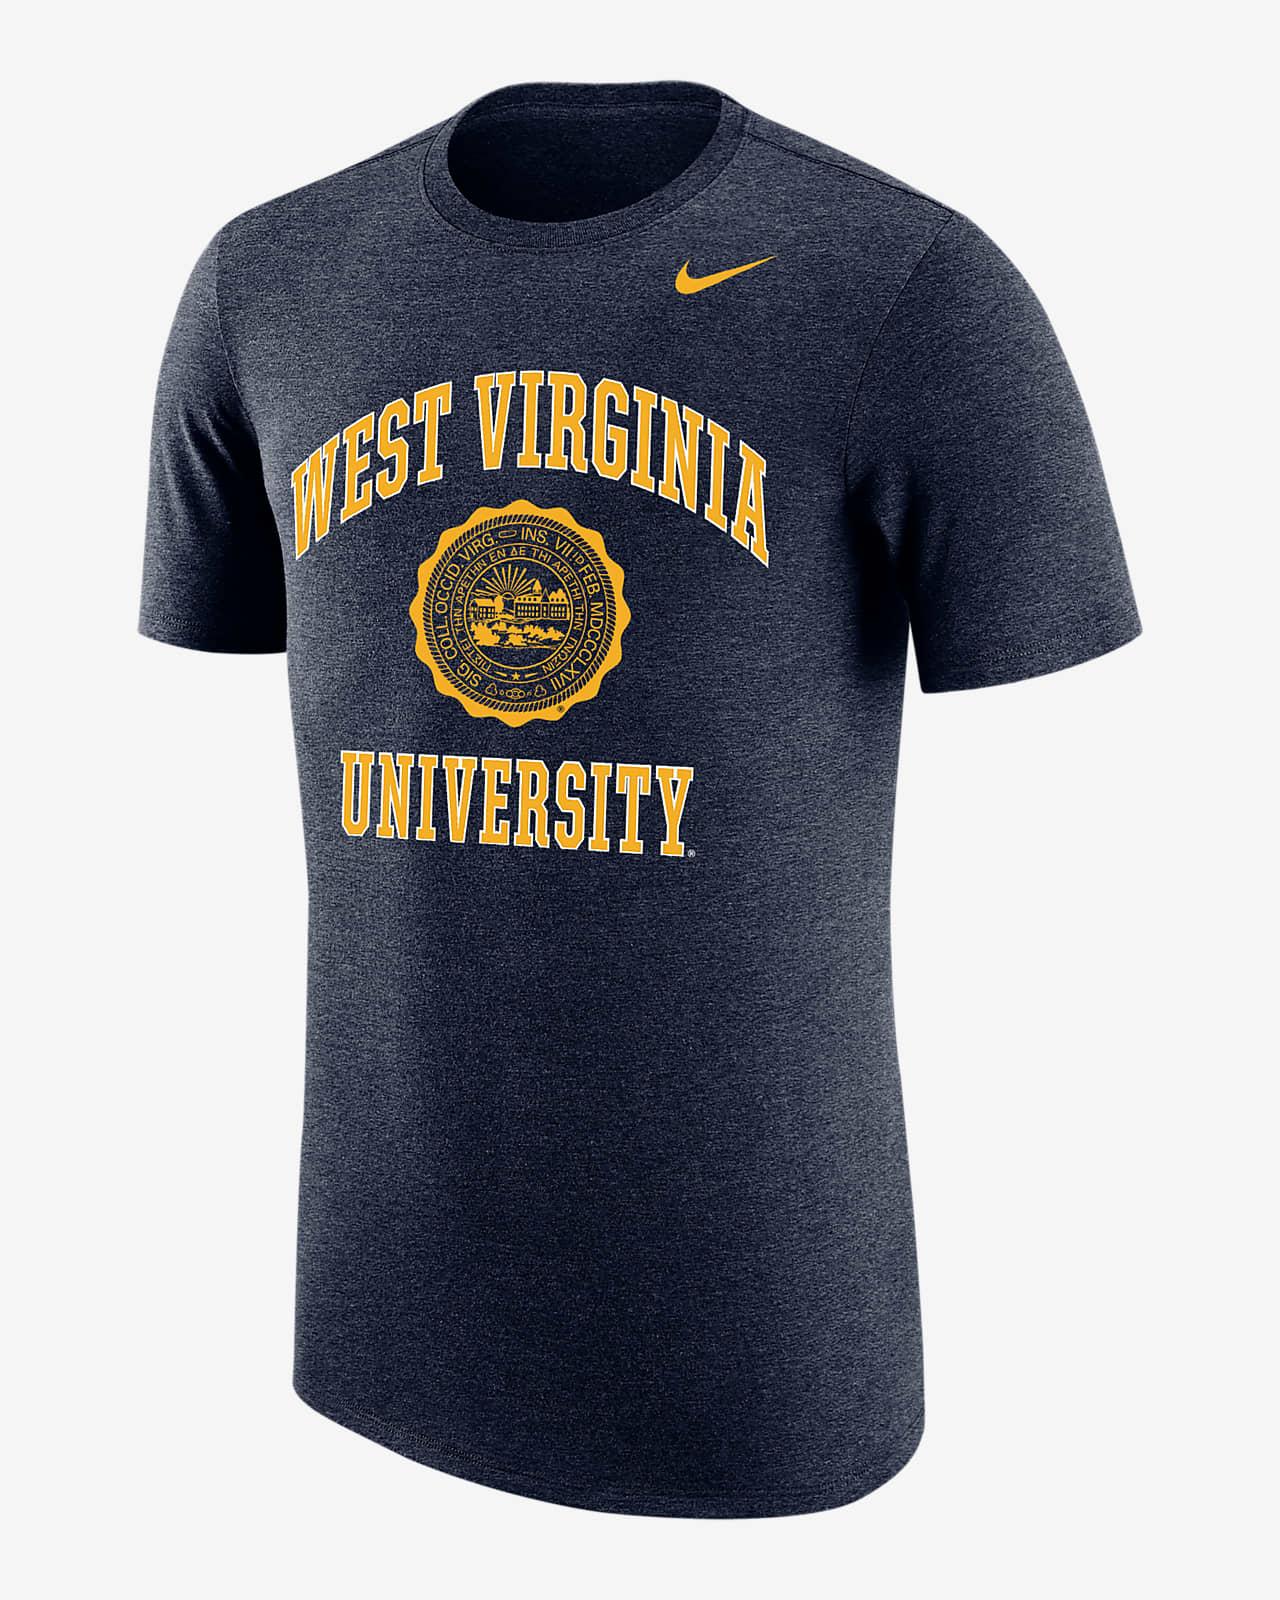 Nike College (West Virginia) Men's T-Shirt